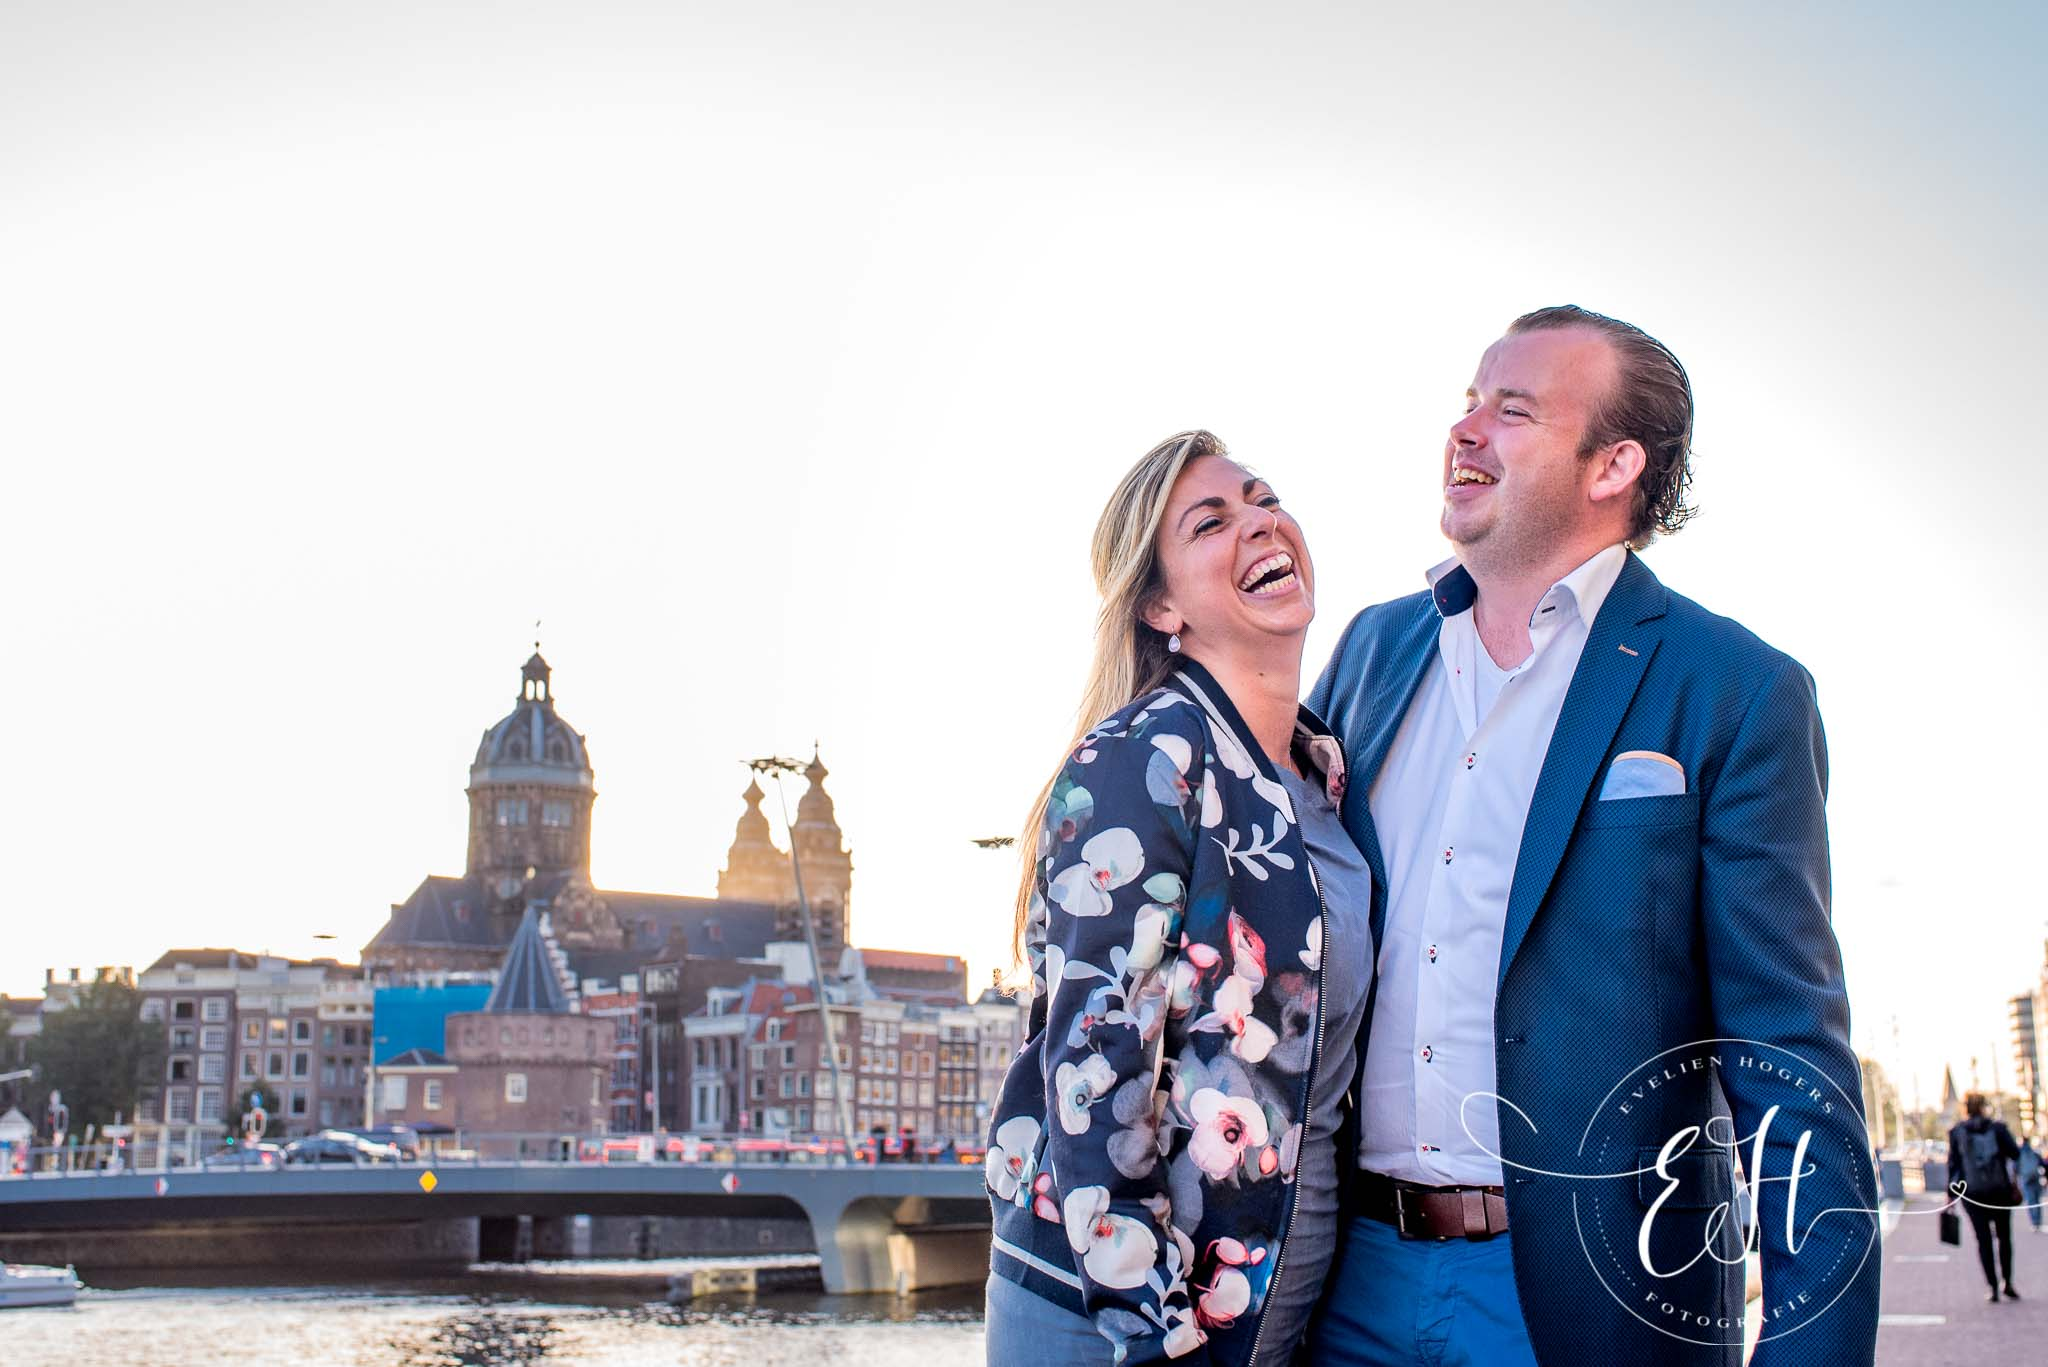 loveshoot-in-amsterdam-evelien-hogers-fotografie (2 van 26).jpg